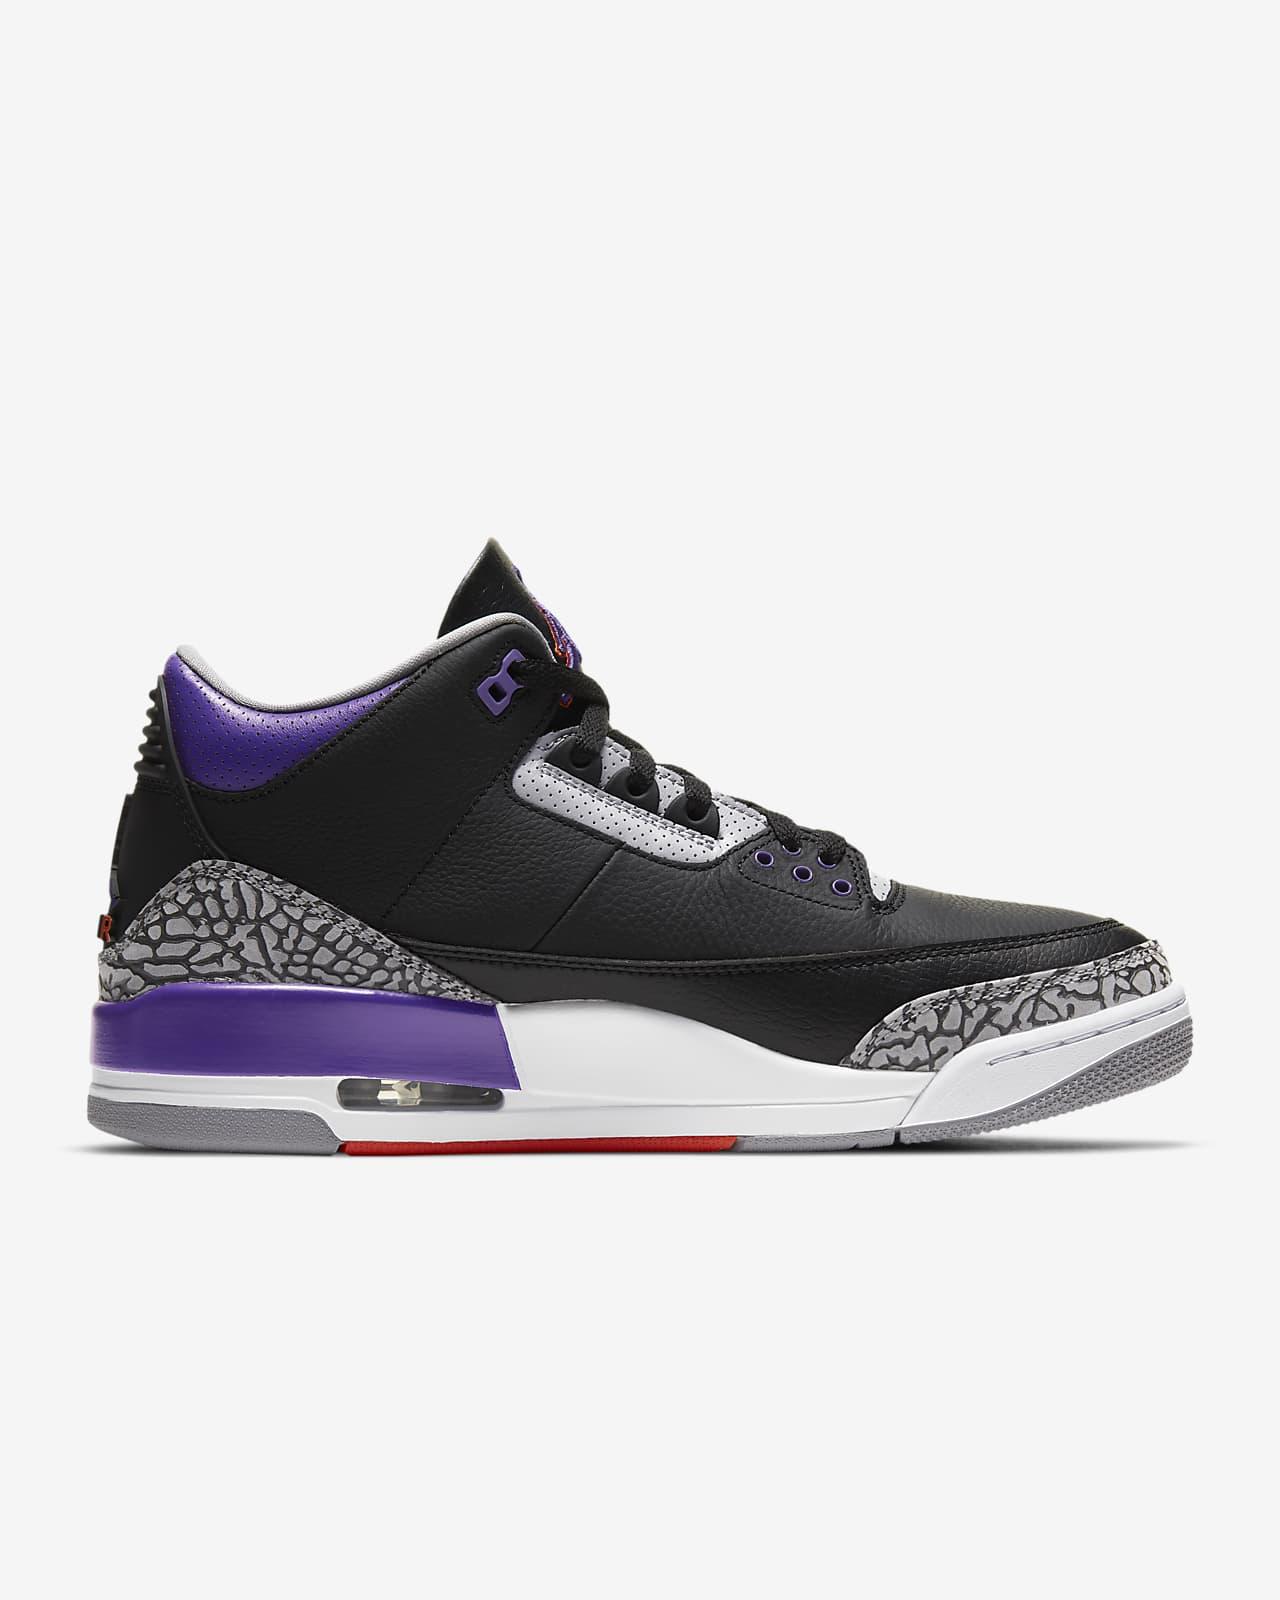 Air Jordan 3 Retro Shoe